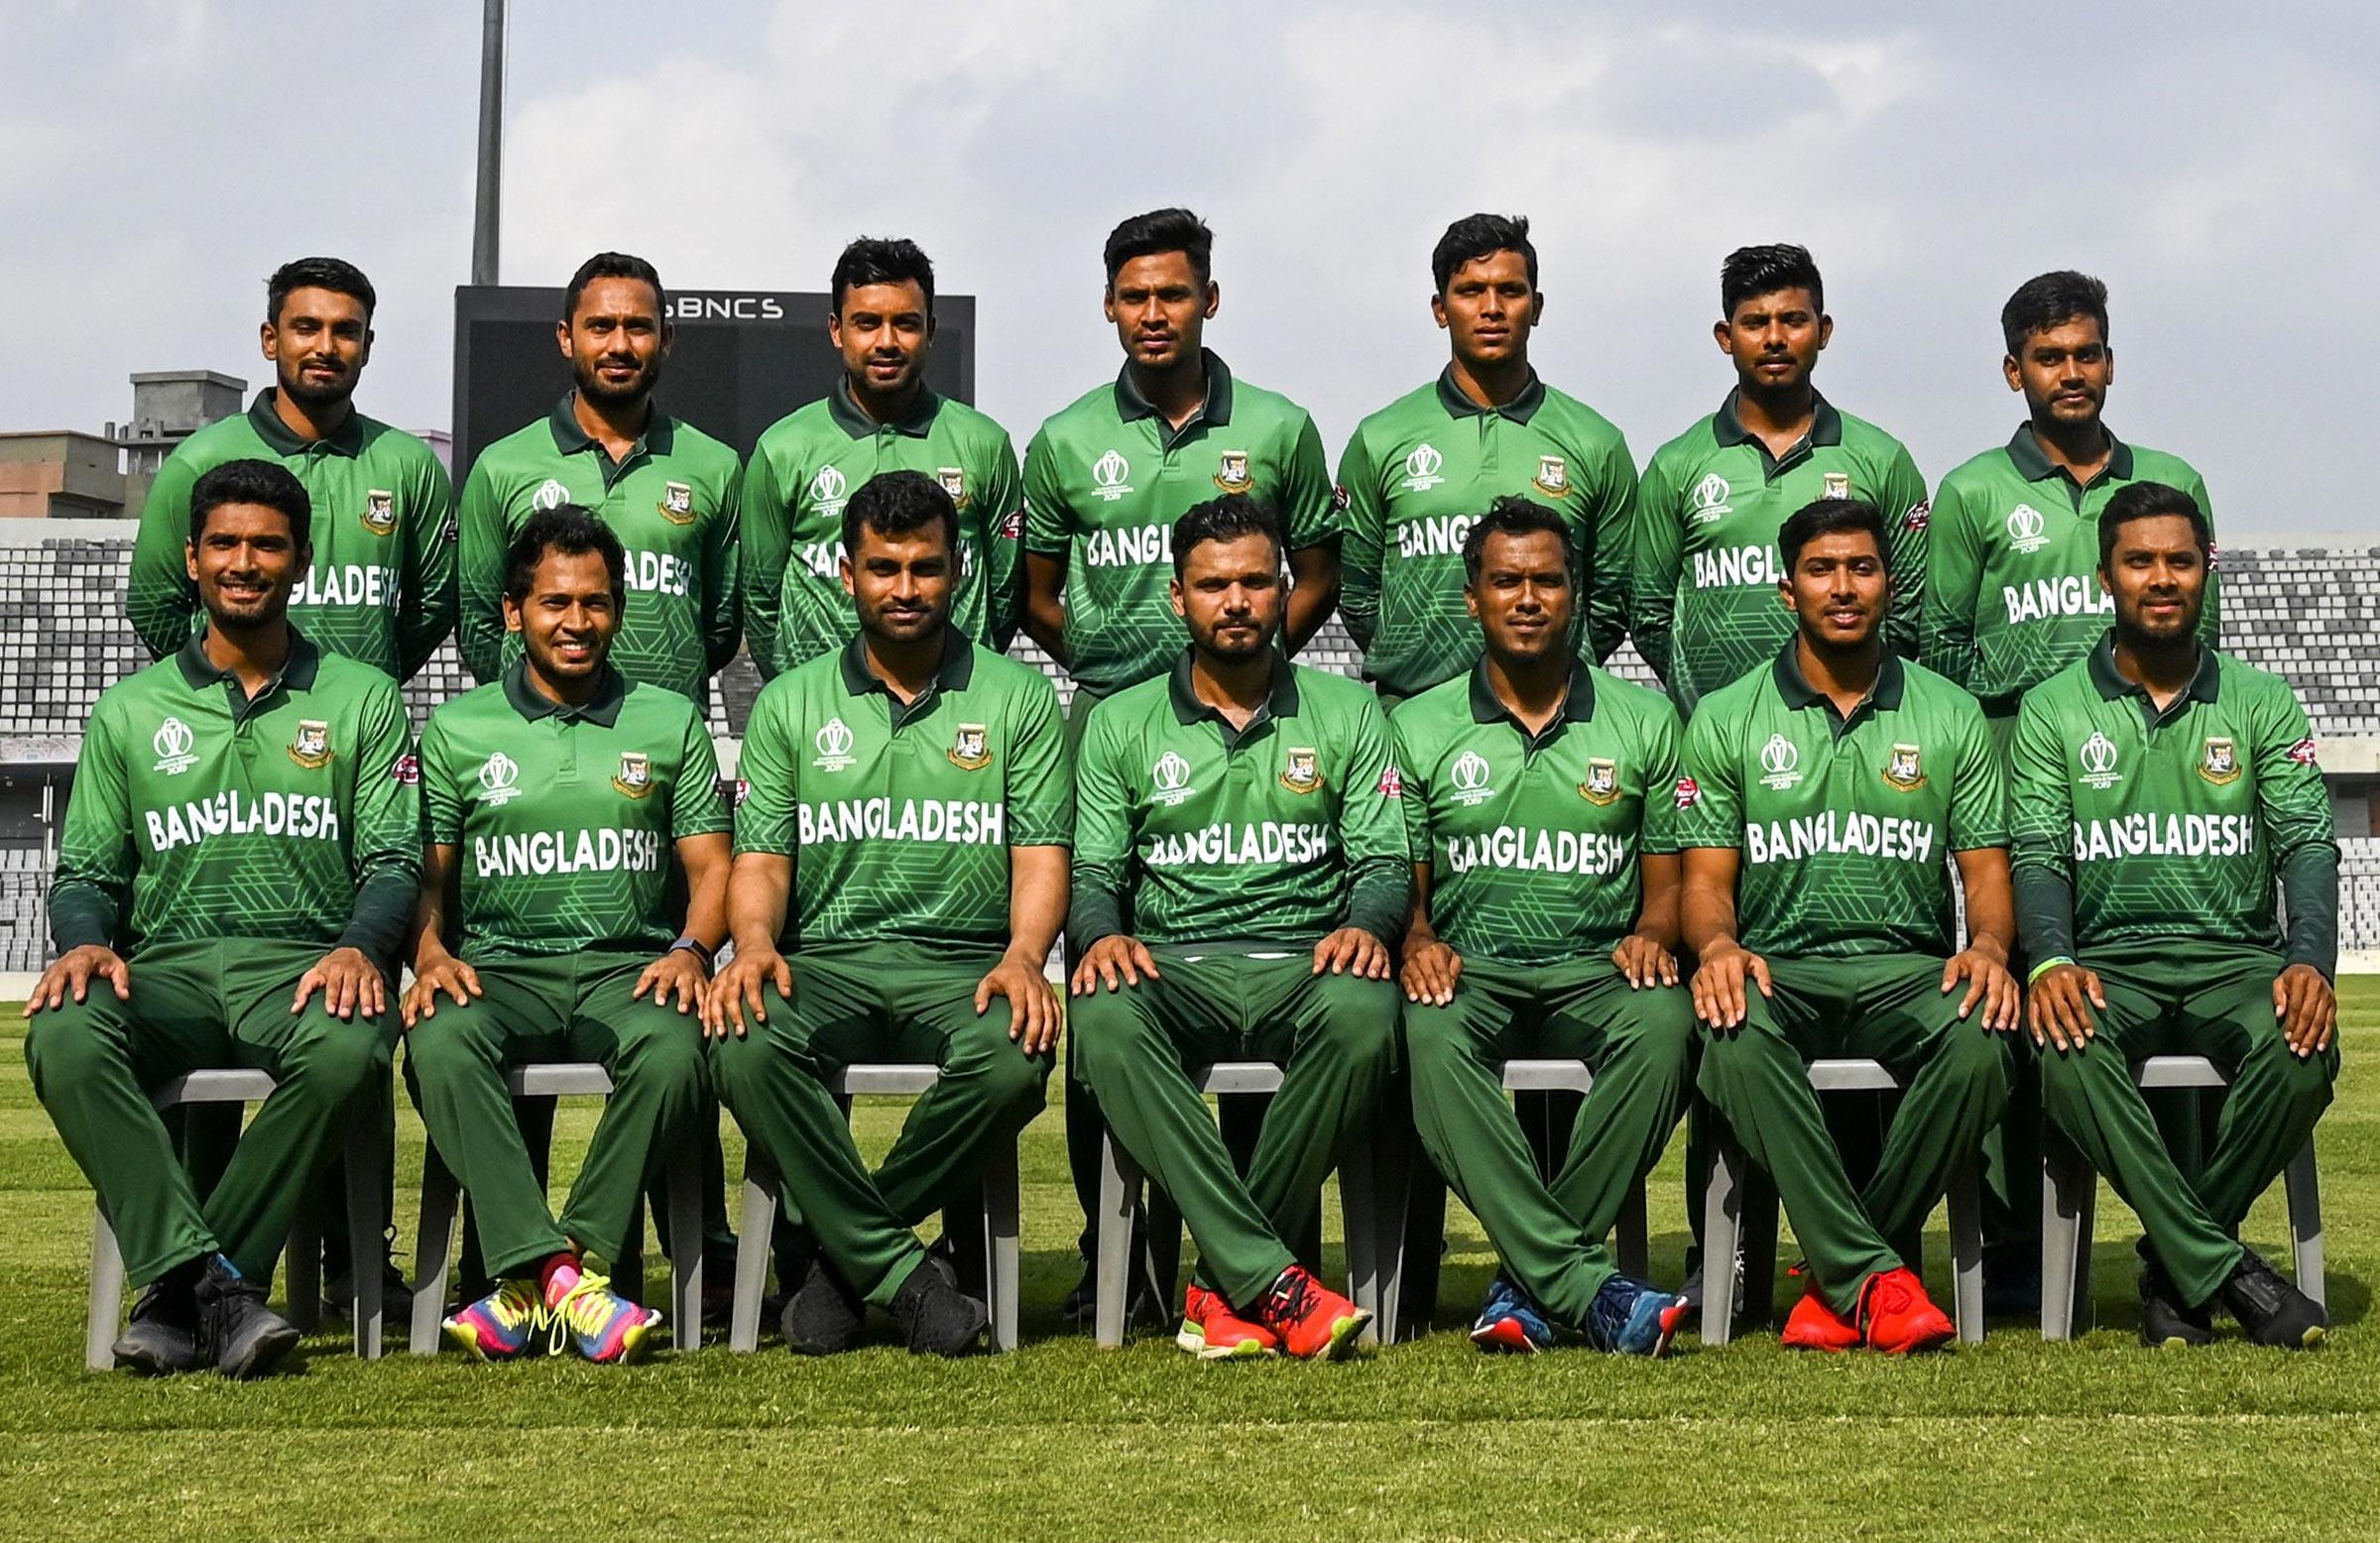 Bangladeshi Cricket Team Zoom Background 4